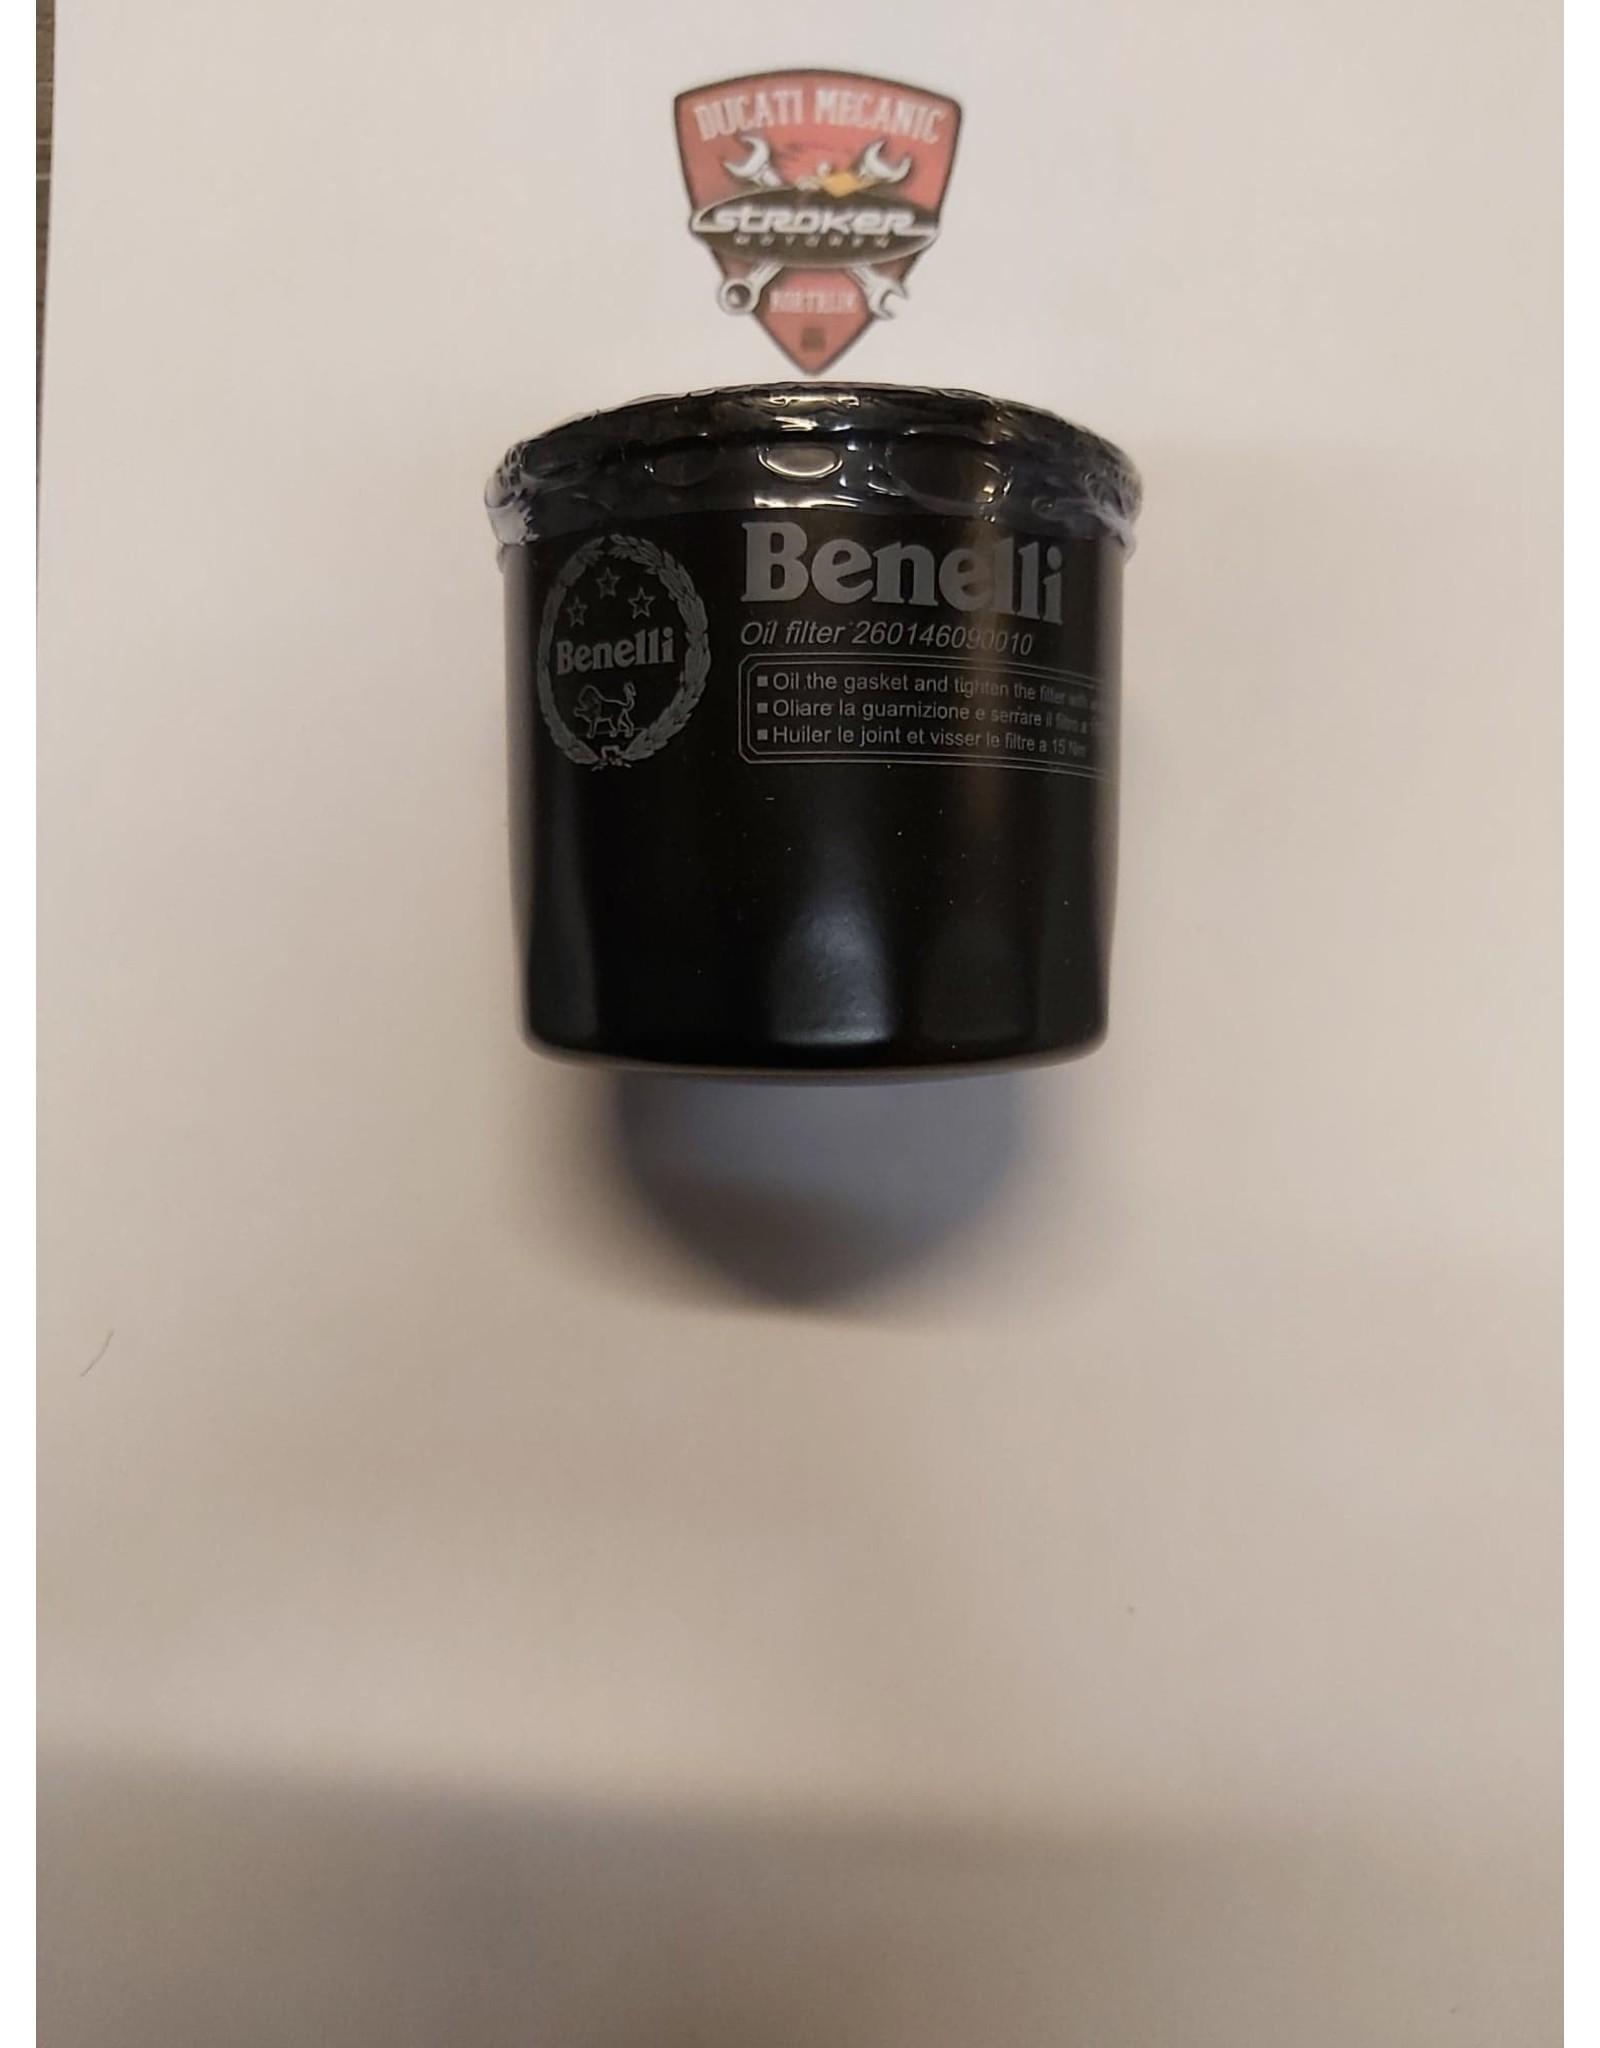 Benelli OLIEFILTER BENELLI